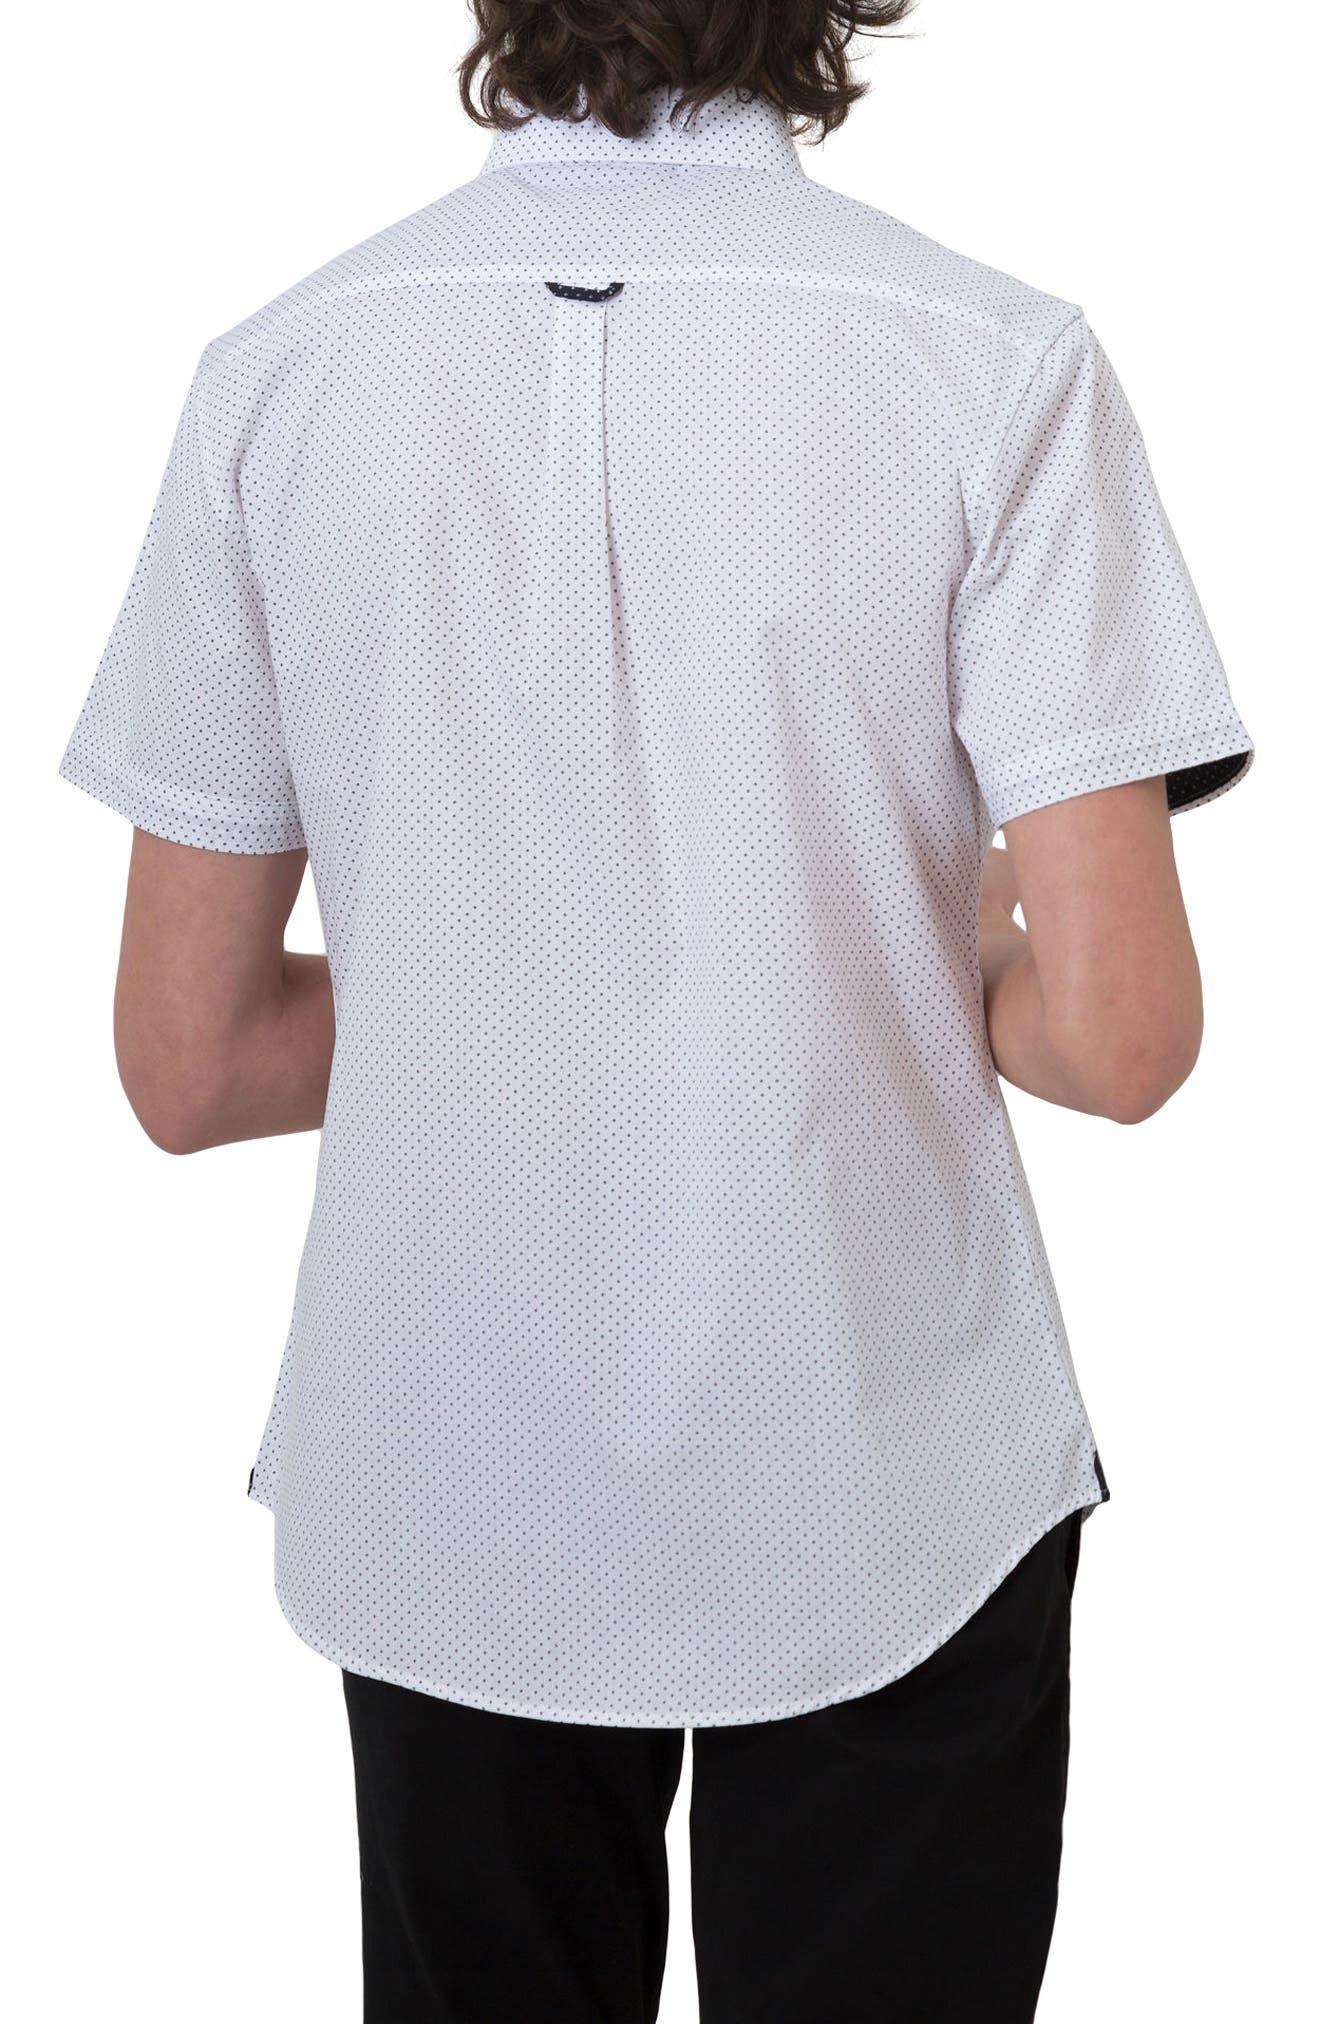 Move On Microprint Woven Shirt,                             Alternate thumbnail 2, color,                             100